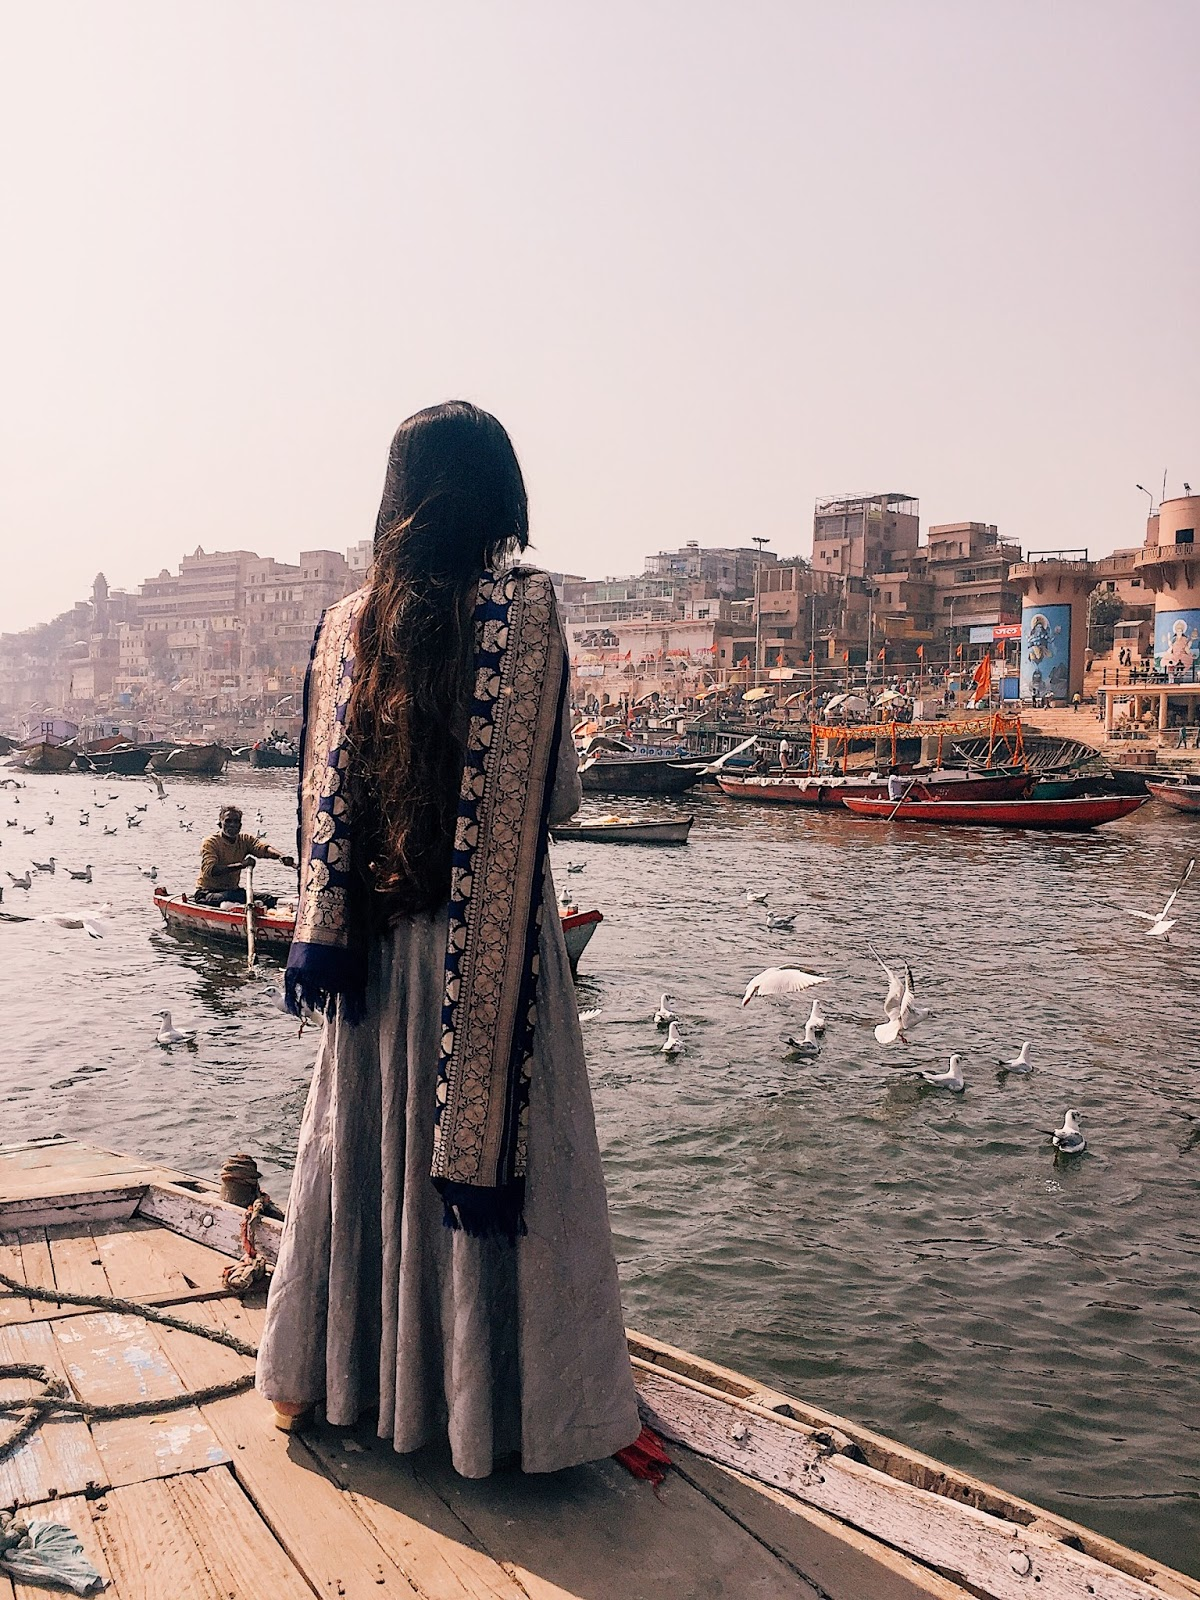 varanasi travel guide, vranasai information, uttar pradesh tourism, tips on varanasi, travel varanasi, spiritual capital of india, city of temples, indian travel blogger, uk blog, benares travel